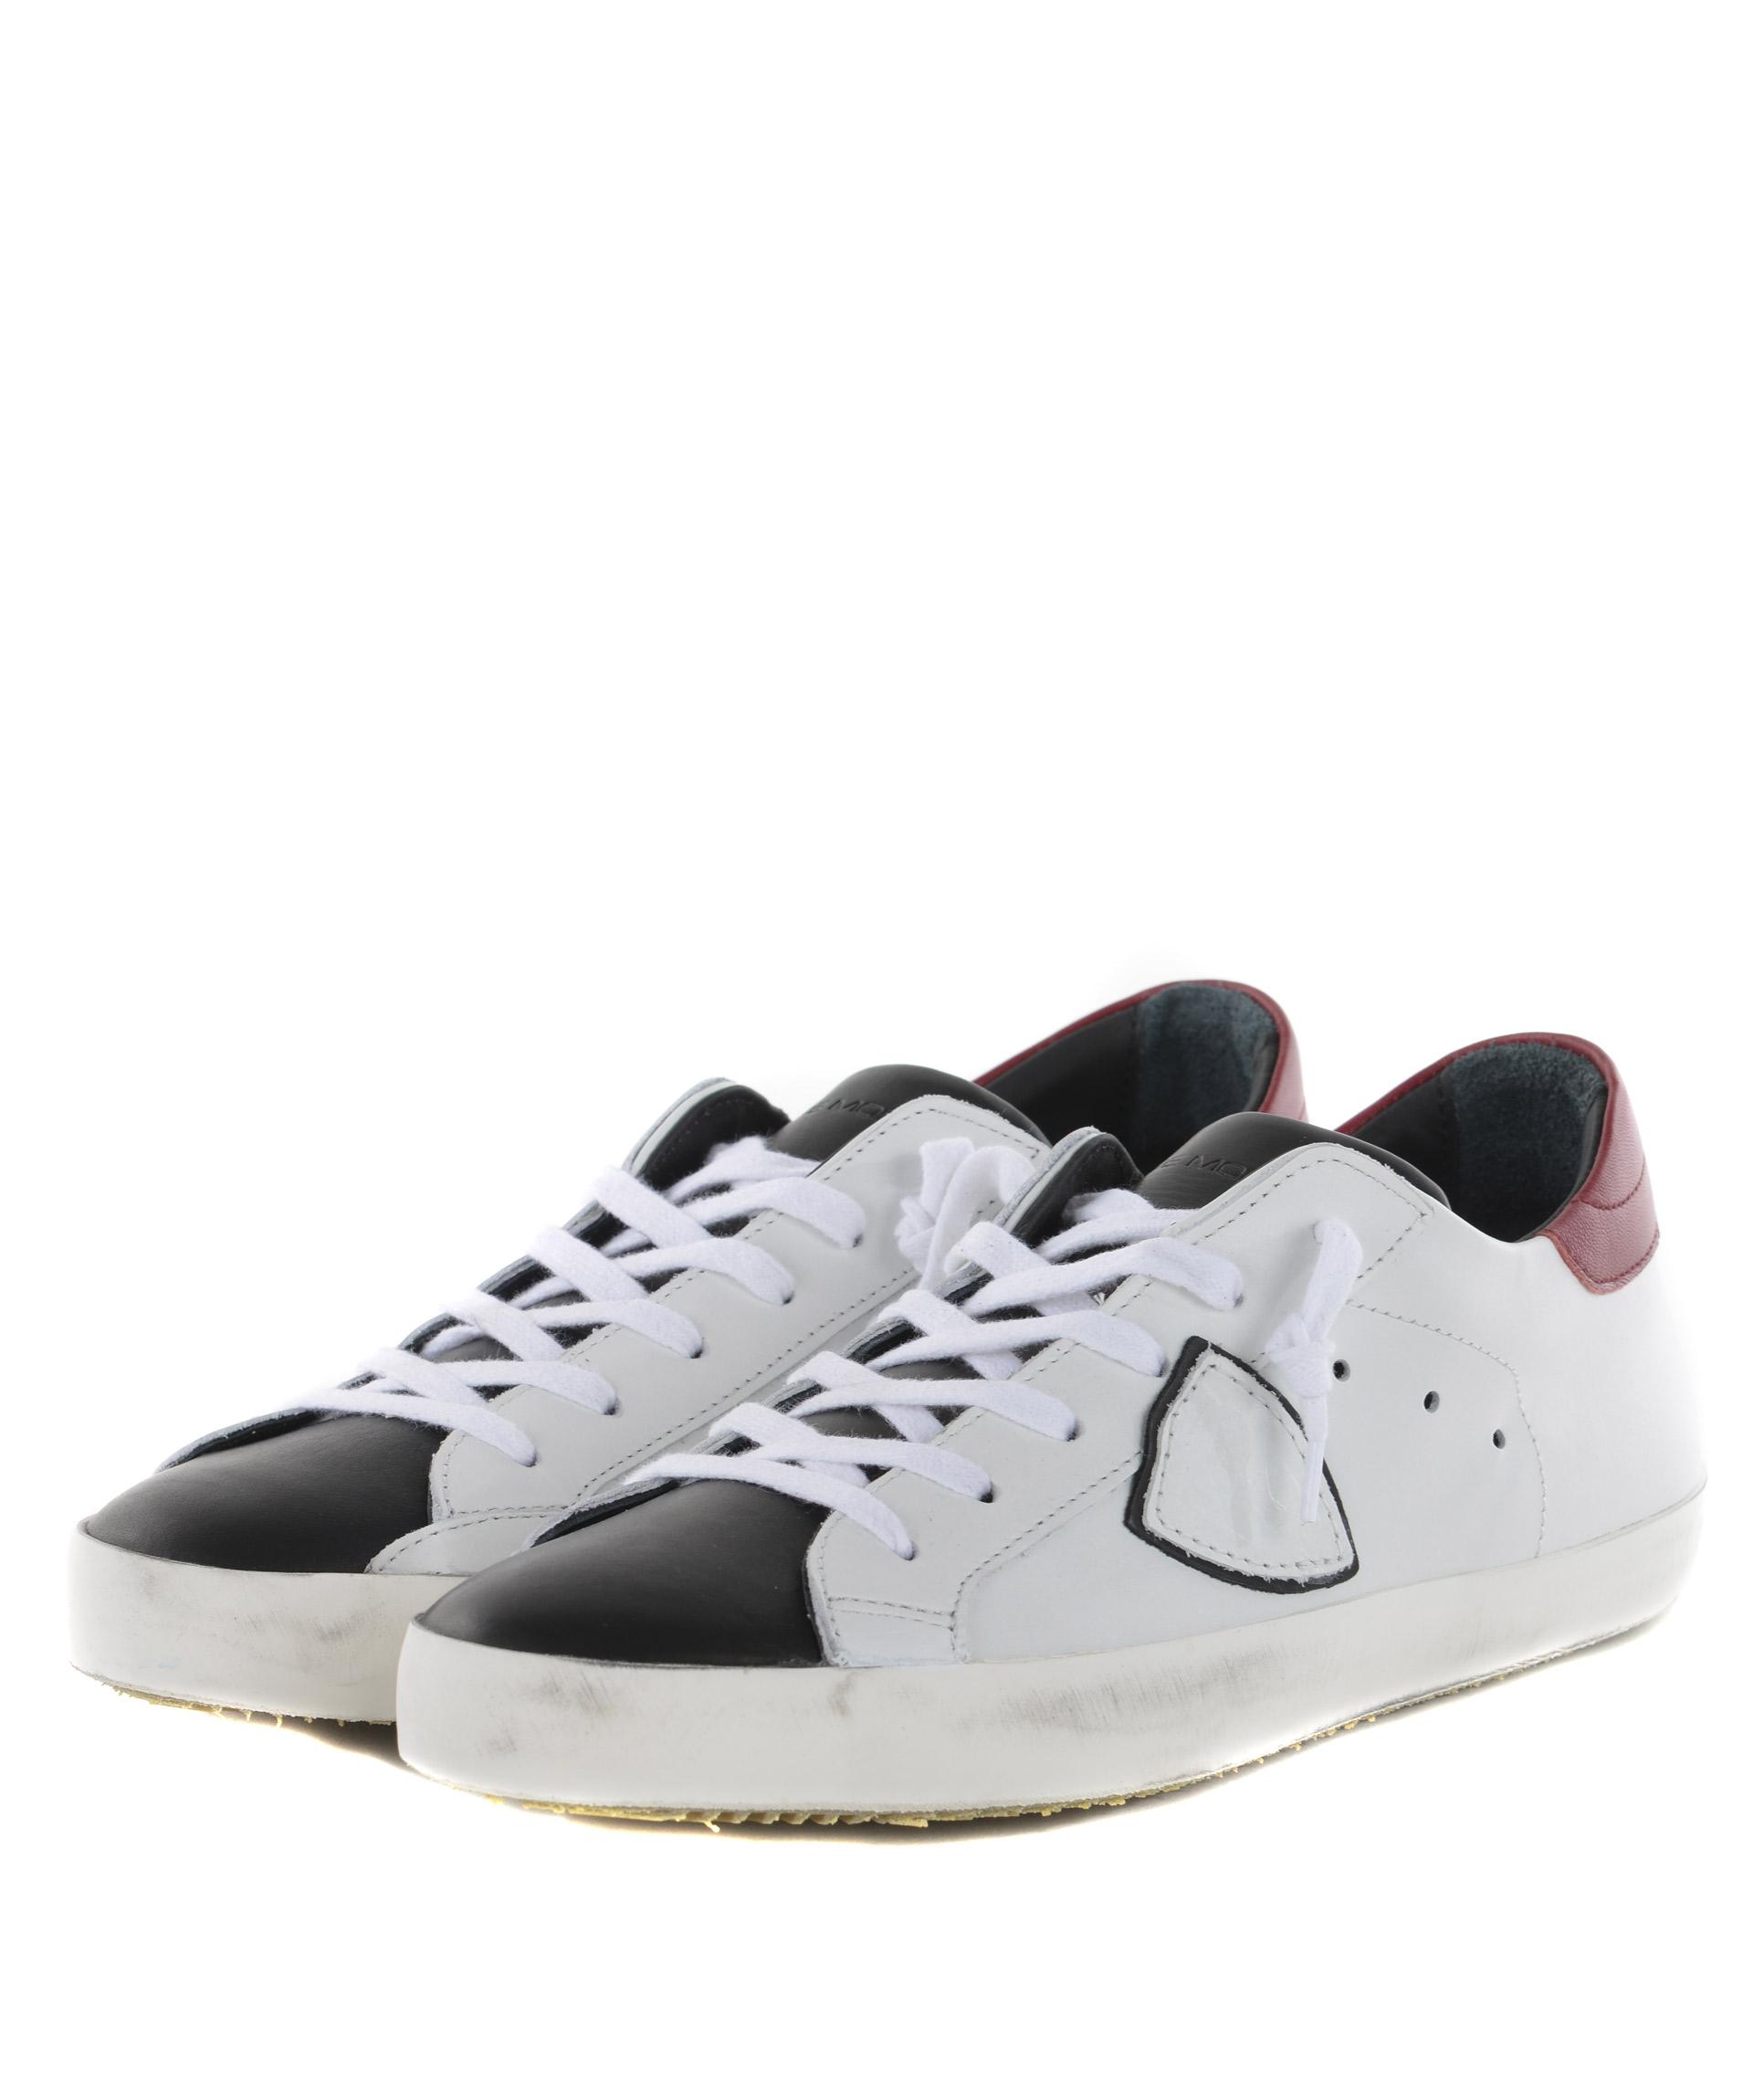 142122805c Sneakers uomo Philippe Model